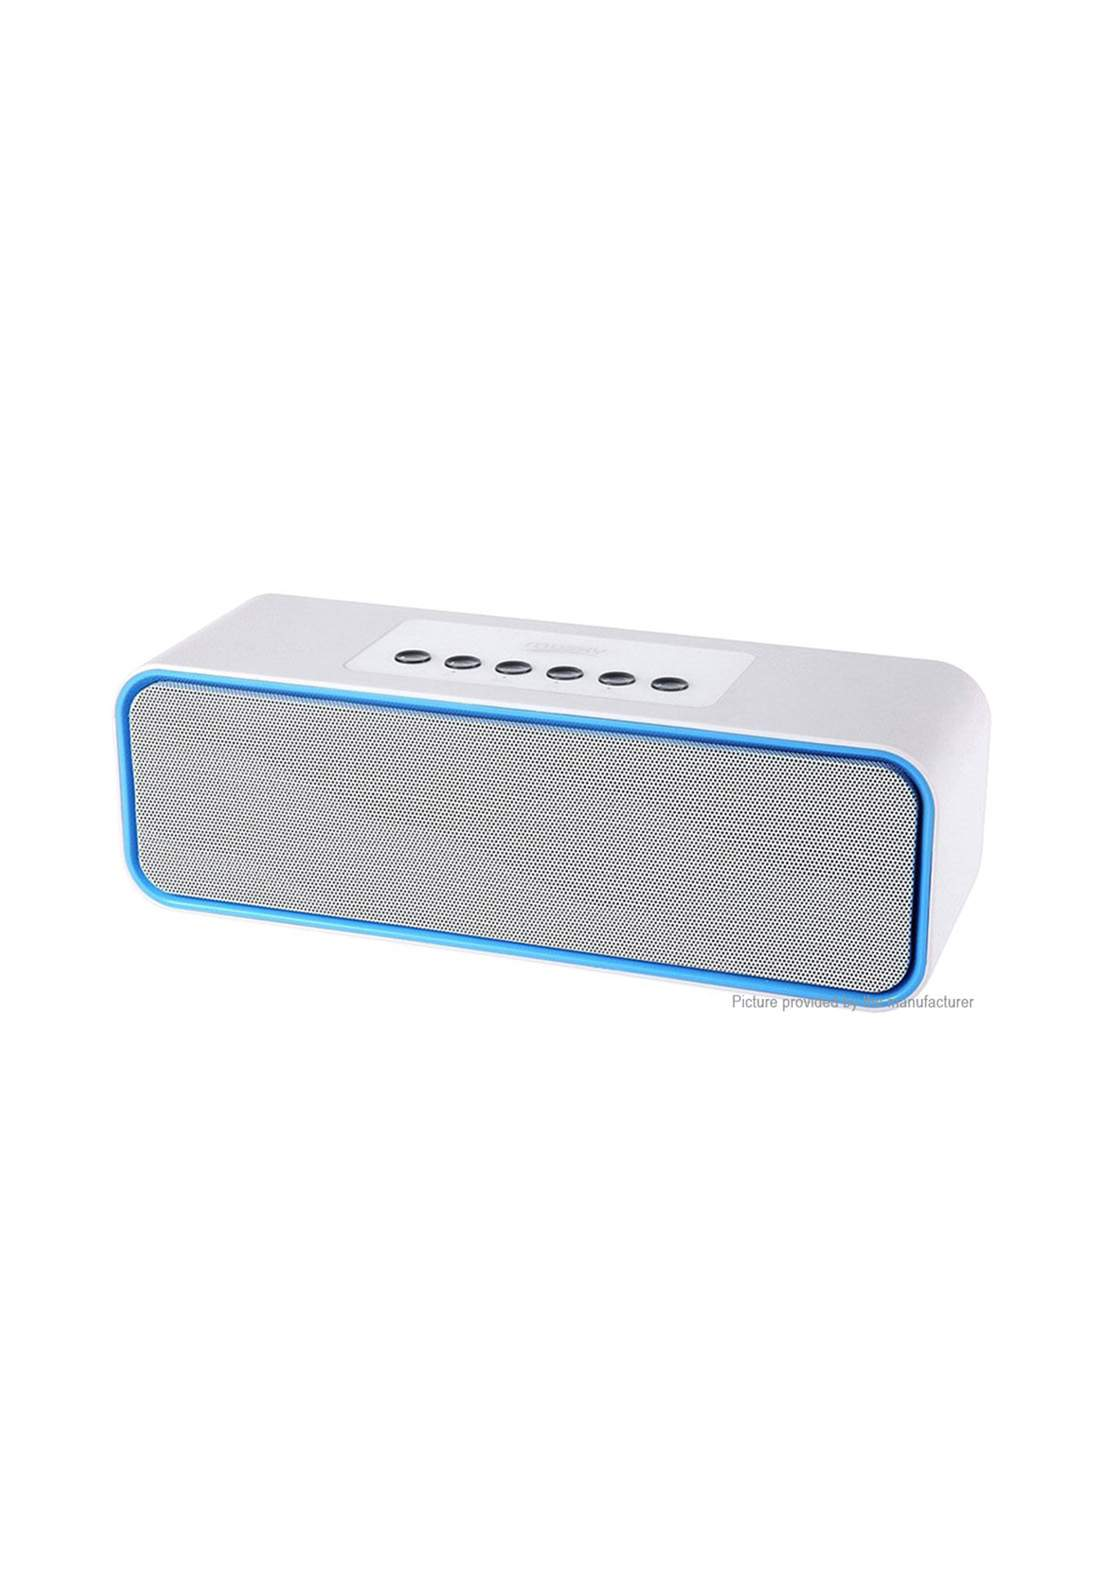 Musky DY-22 Bluetooth Speaker - White   مكبر صوت